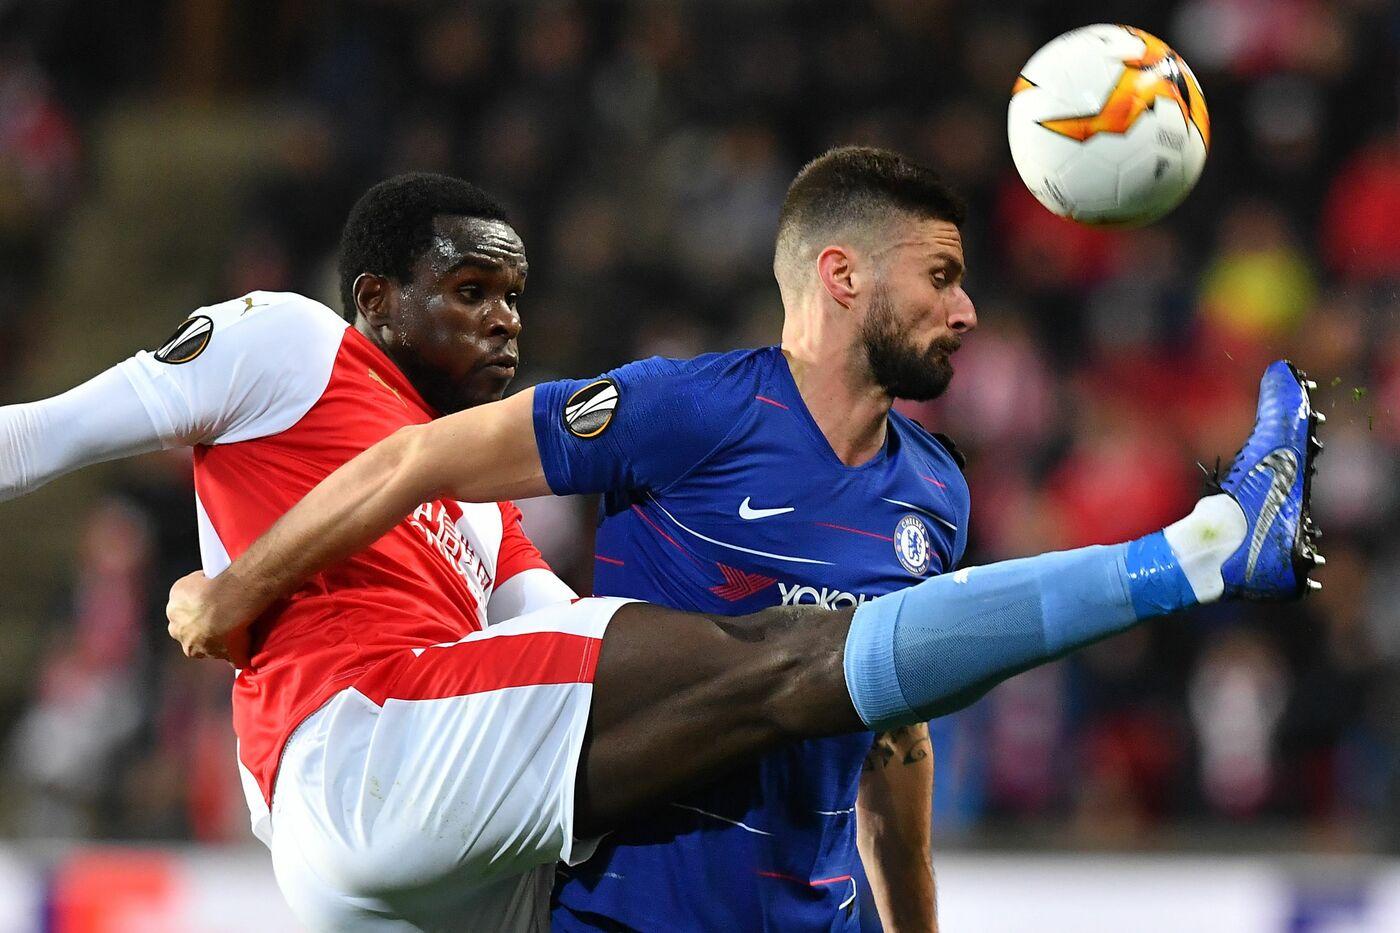 Giroud (Foto AFP/LaPresse)